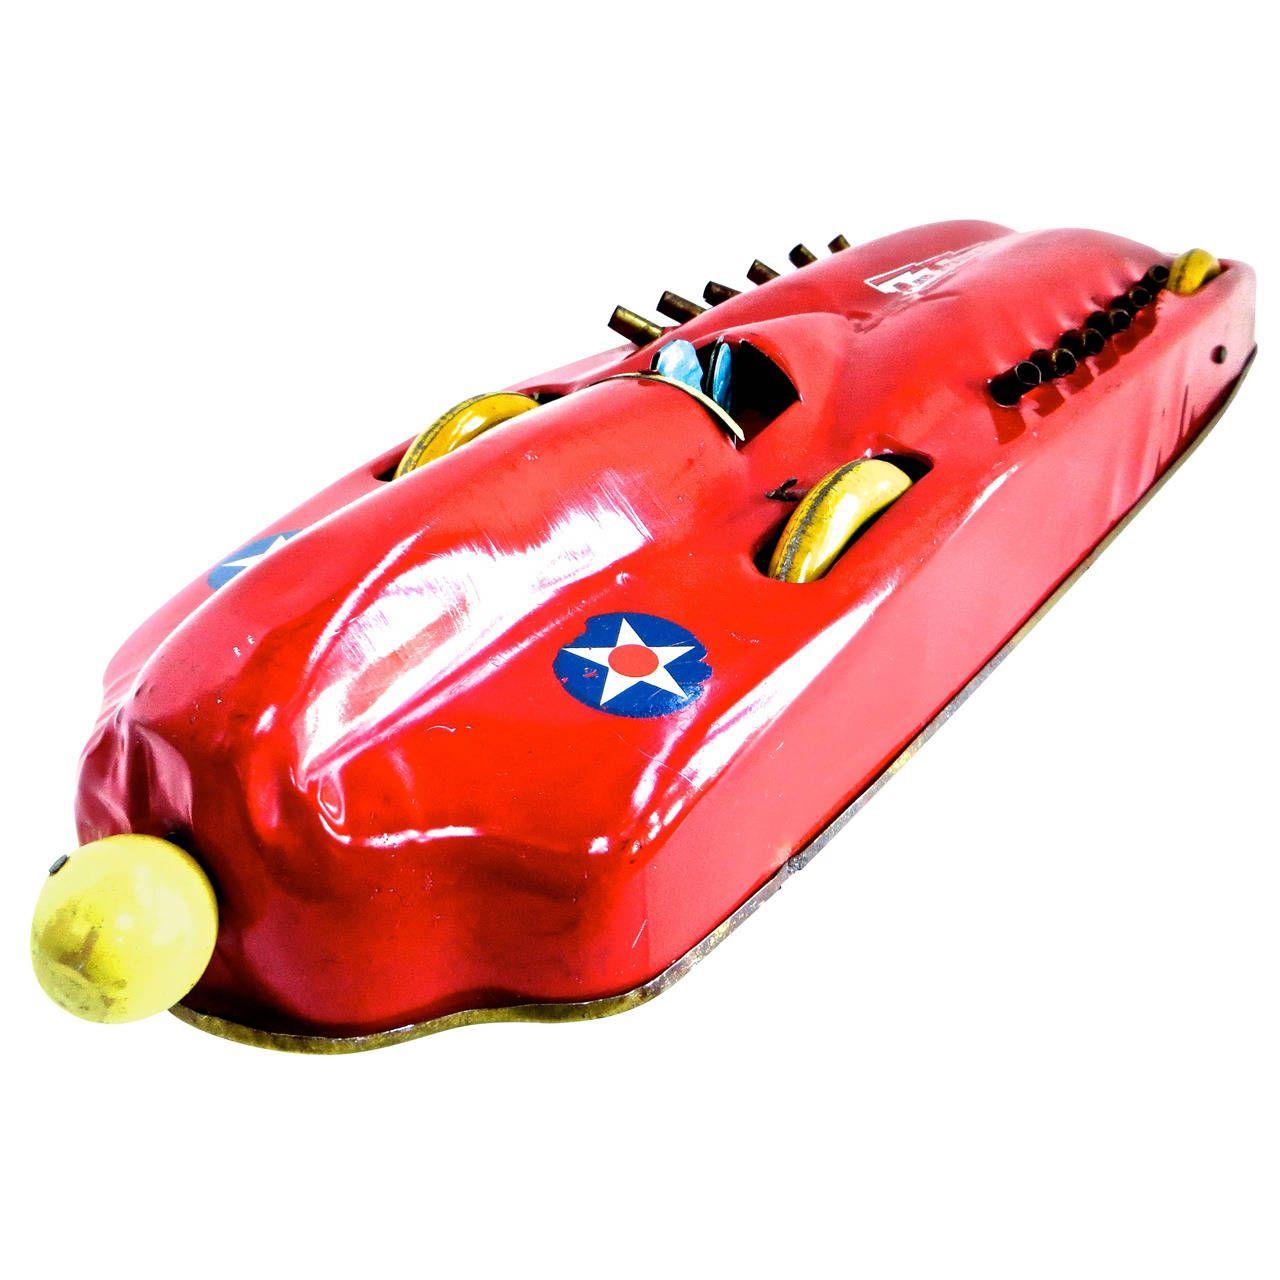 """Red Streak"" Racing Car by Buffalo Toy Company, circa 1928"